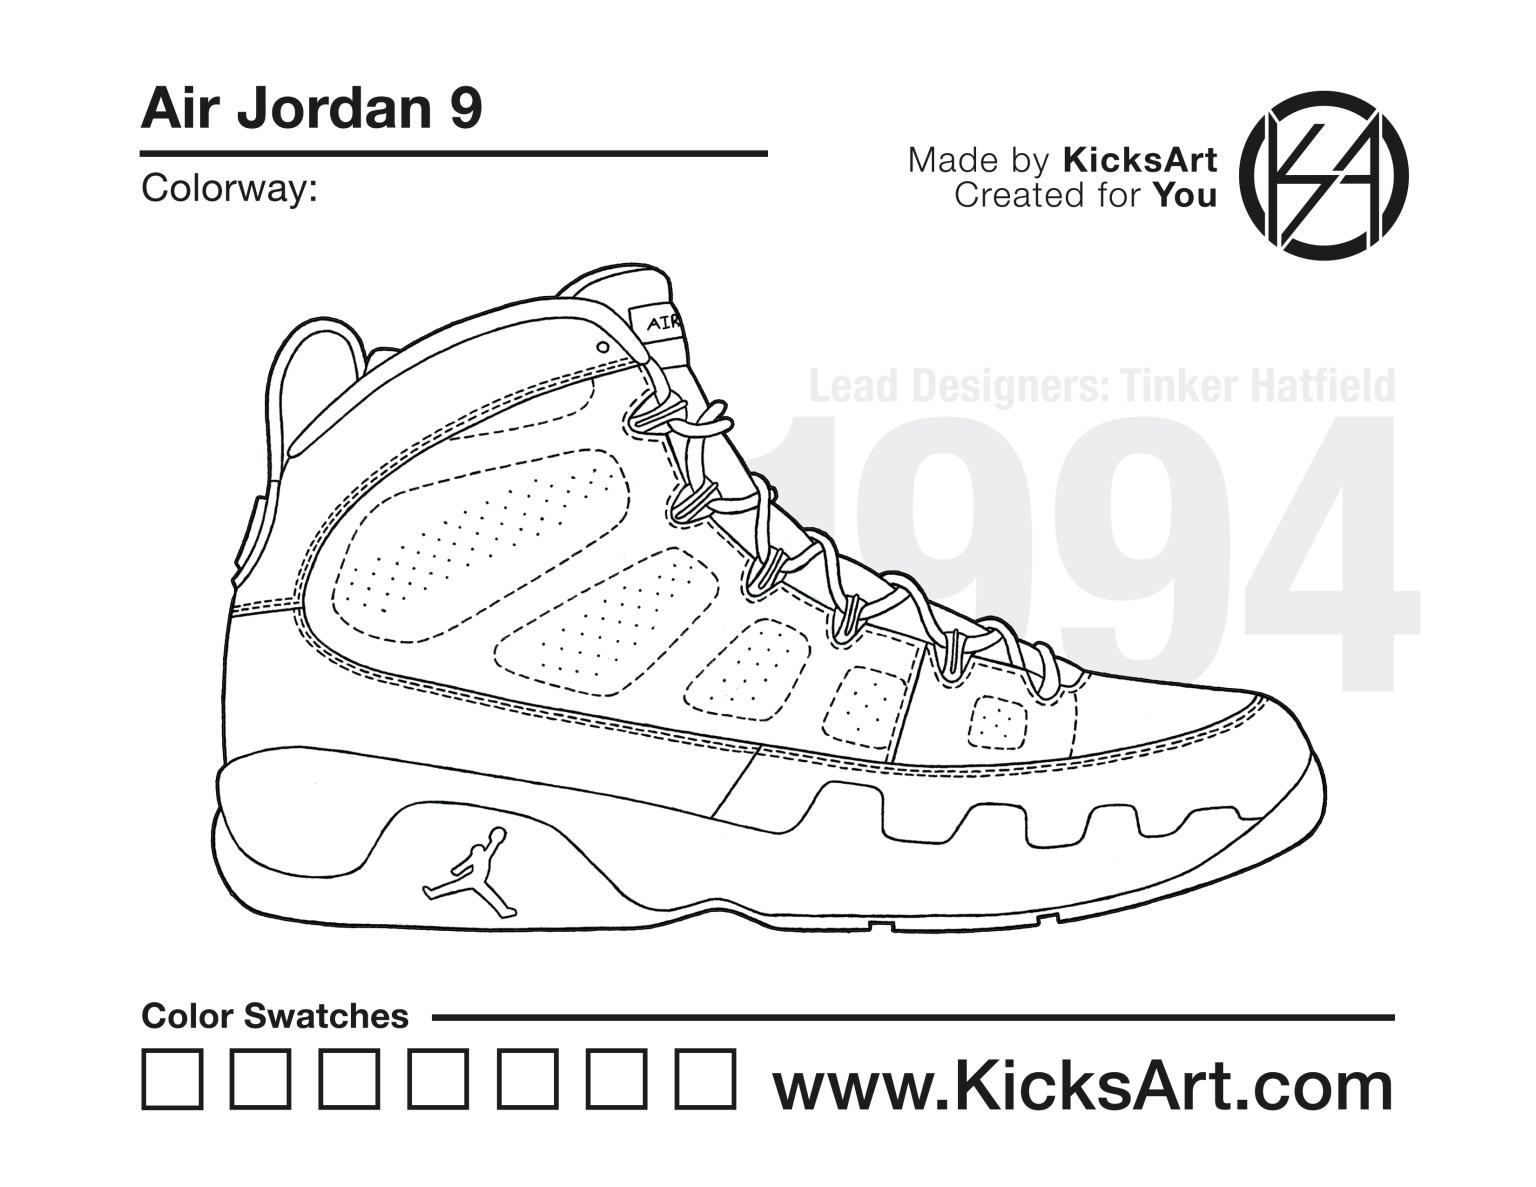 Air Jordan 9 Sneaker Coloring Pages Created By Kicksart